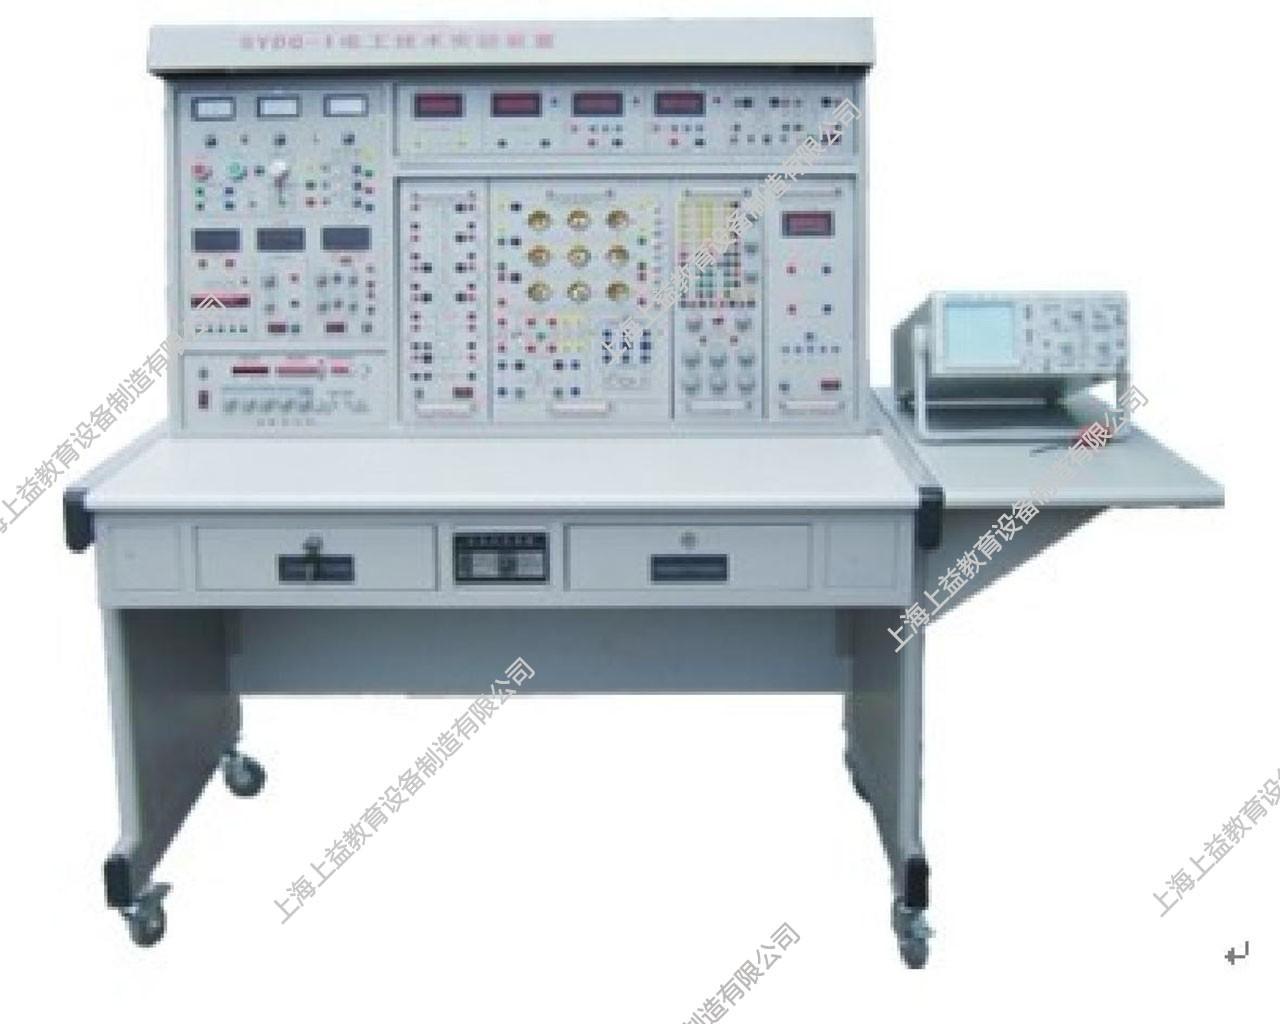 SYGDG-188F 电工/电子/电拖/PLC/变频调速综合实验装置